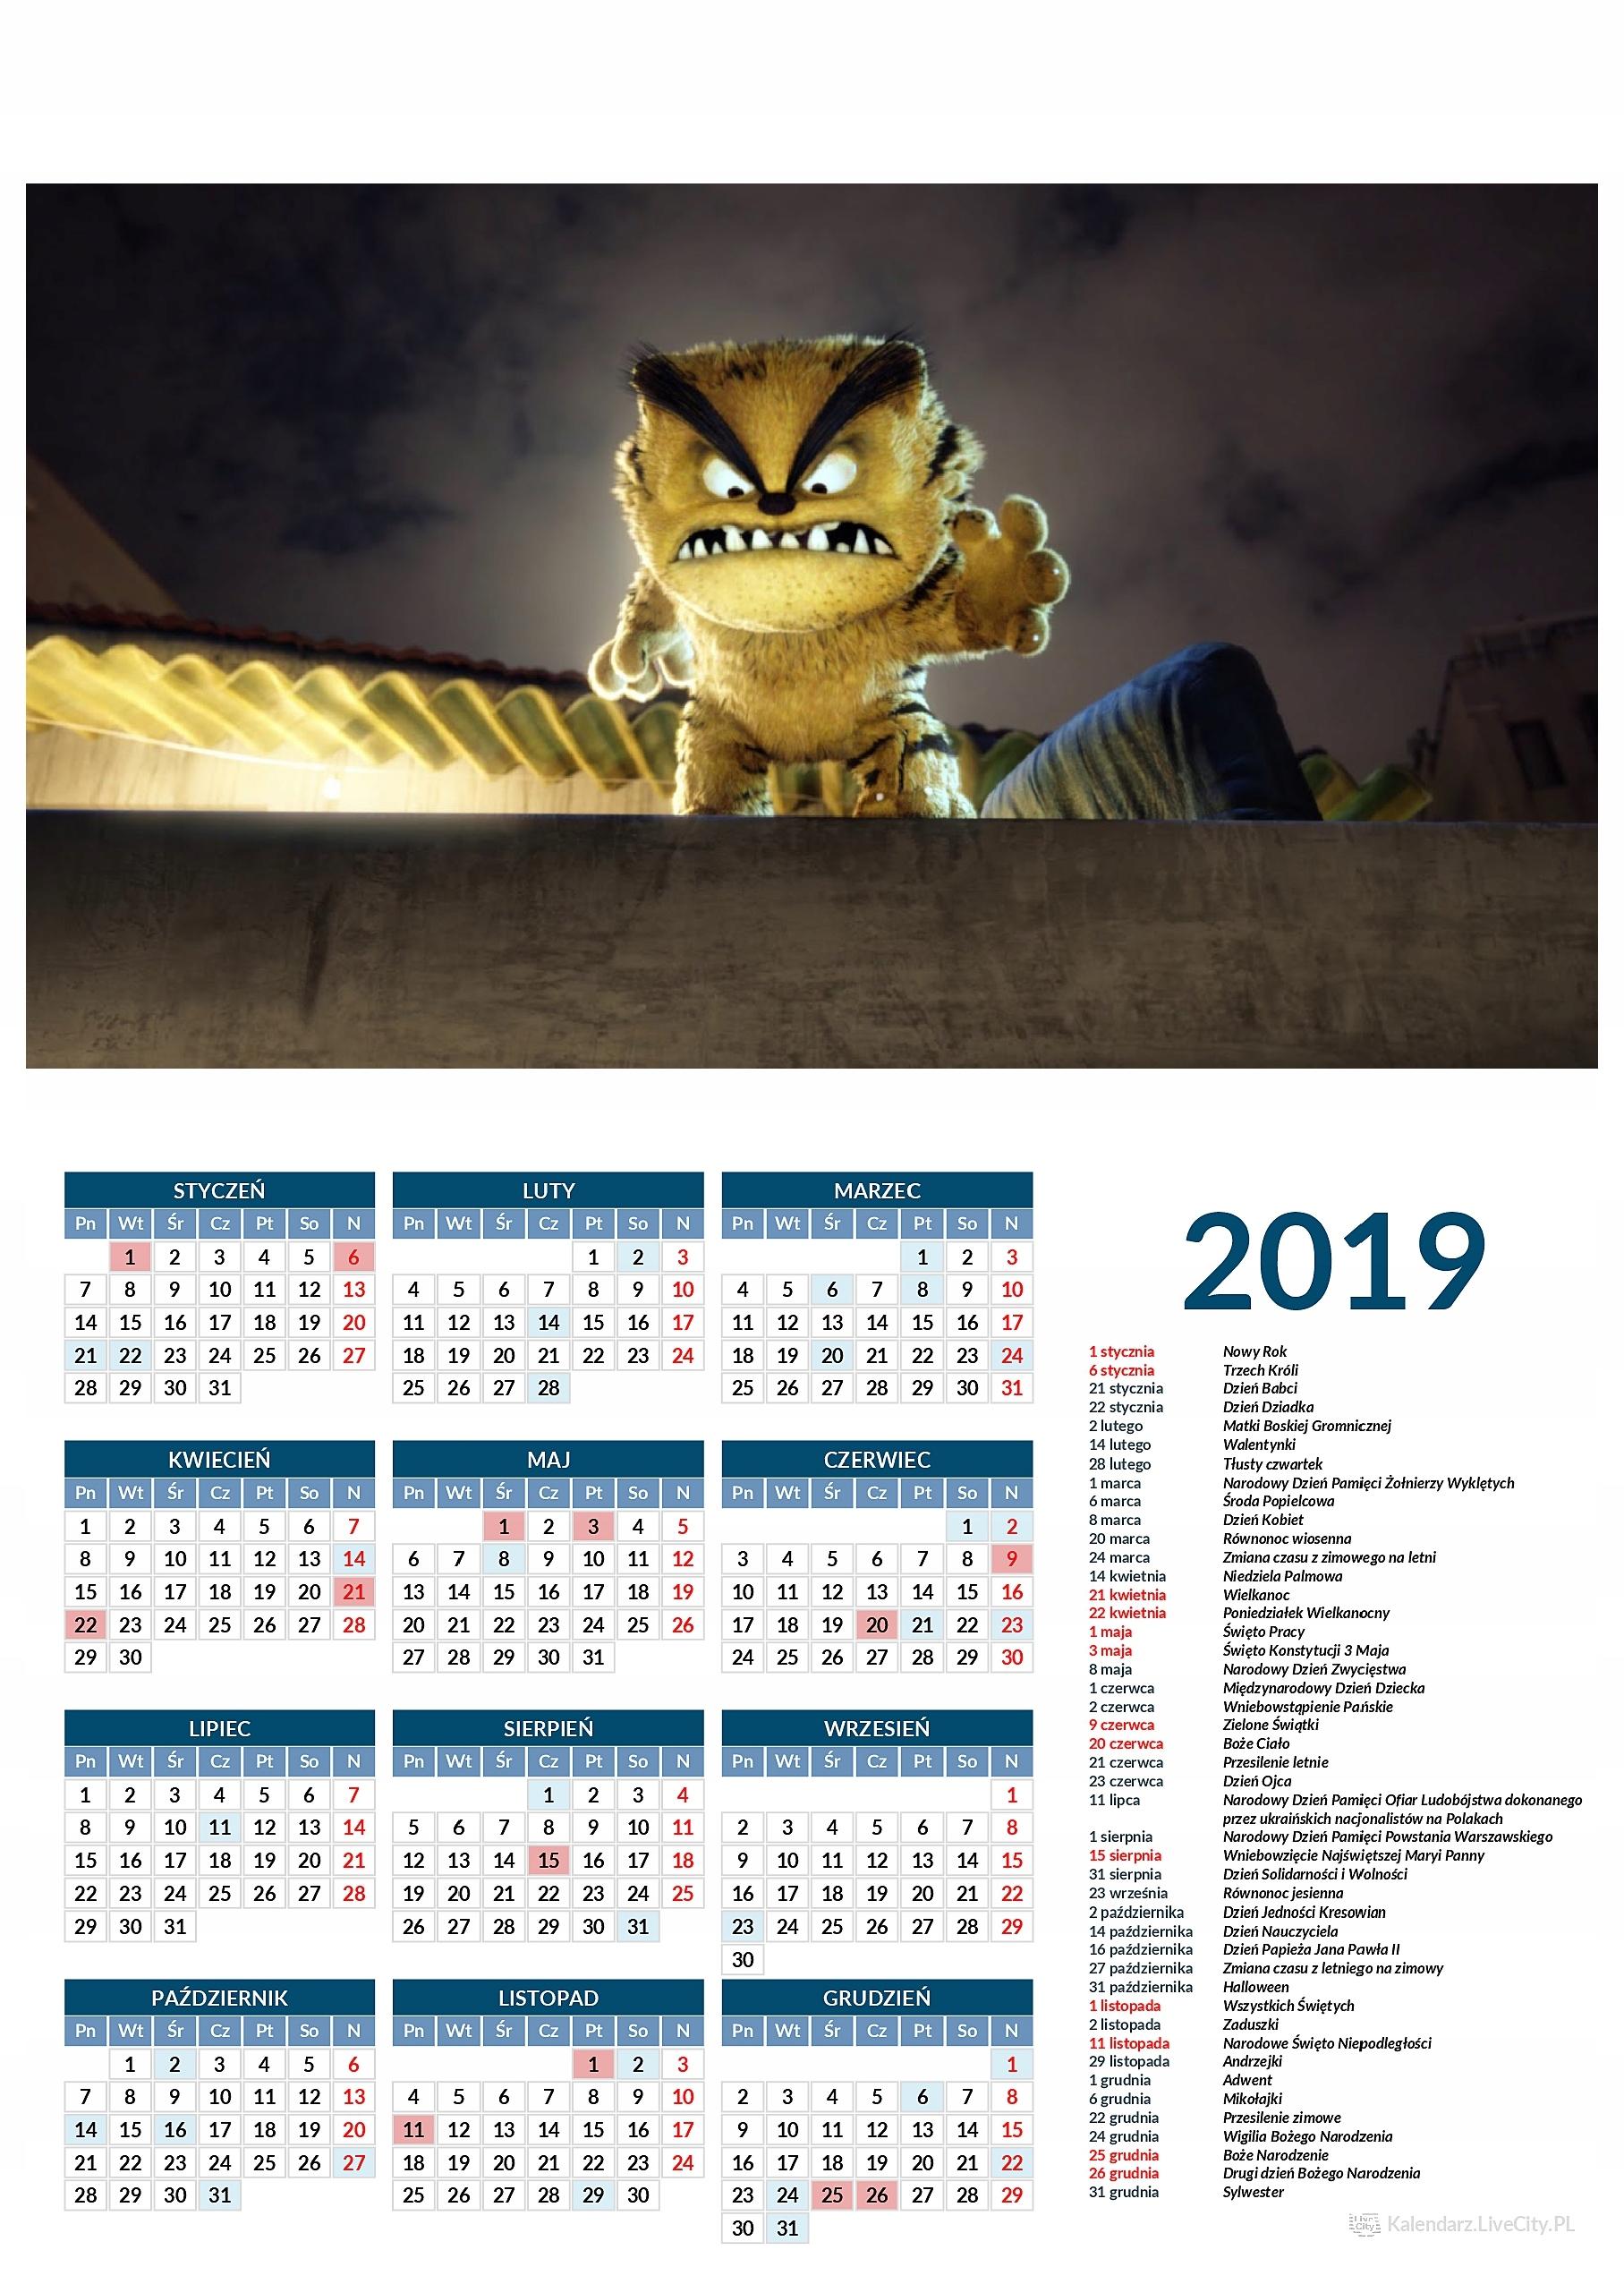 Kalendarz 2019 film kocur